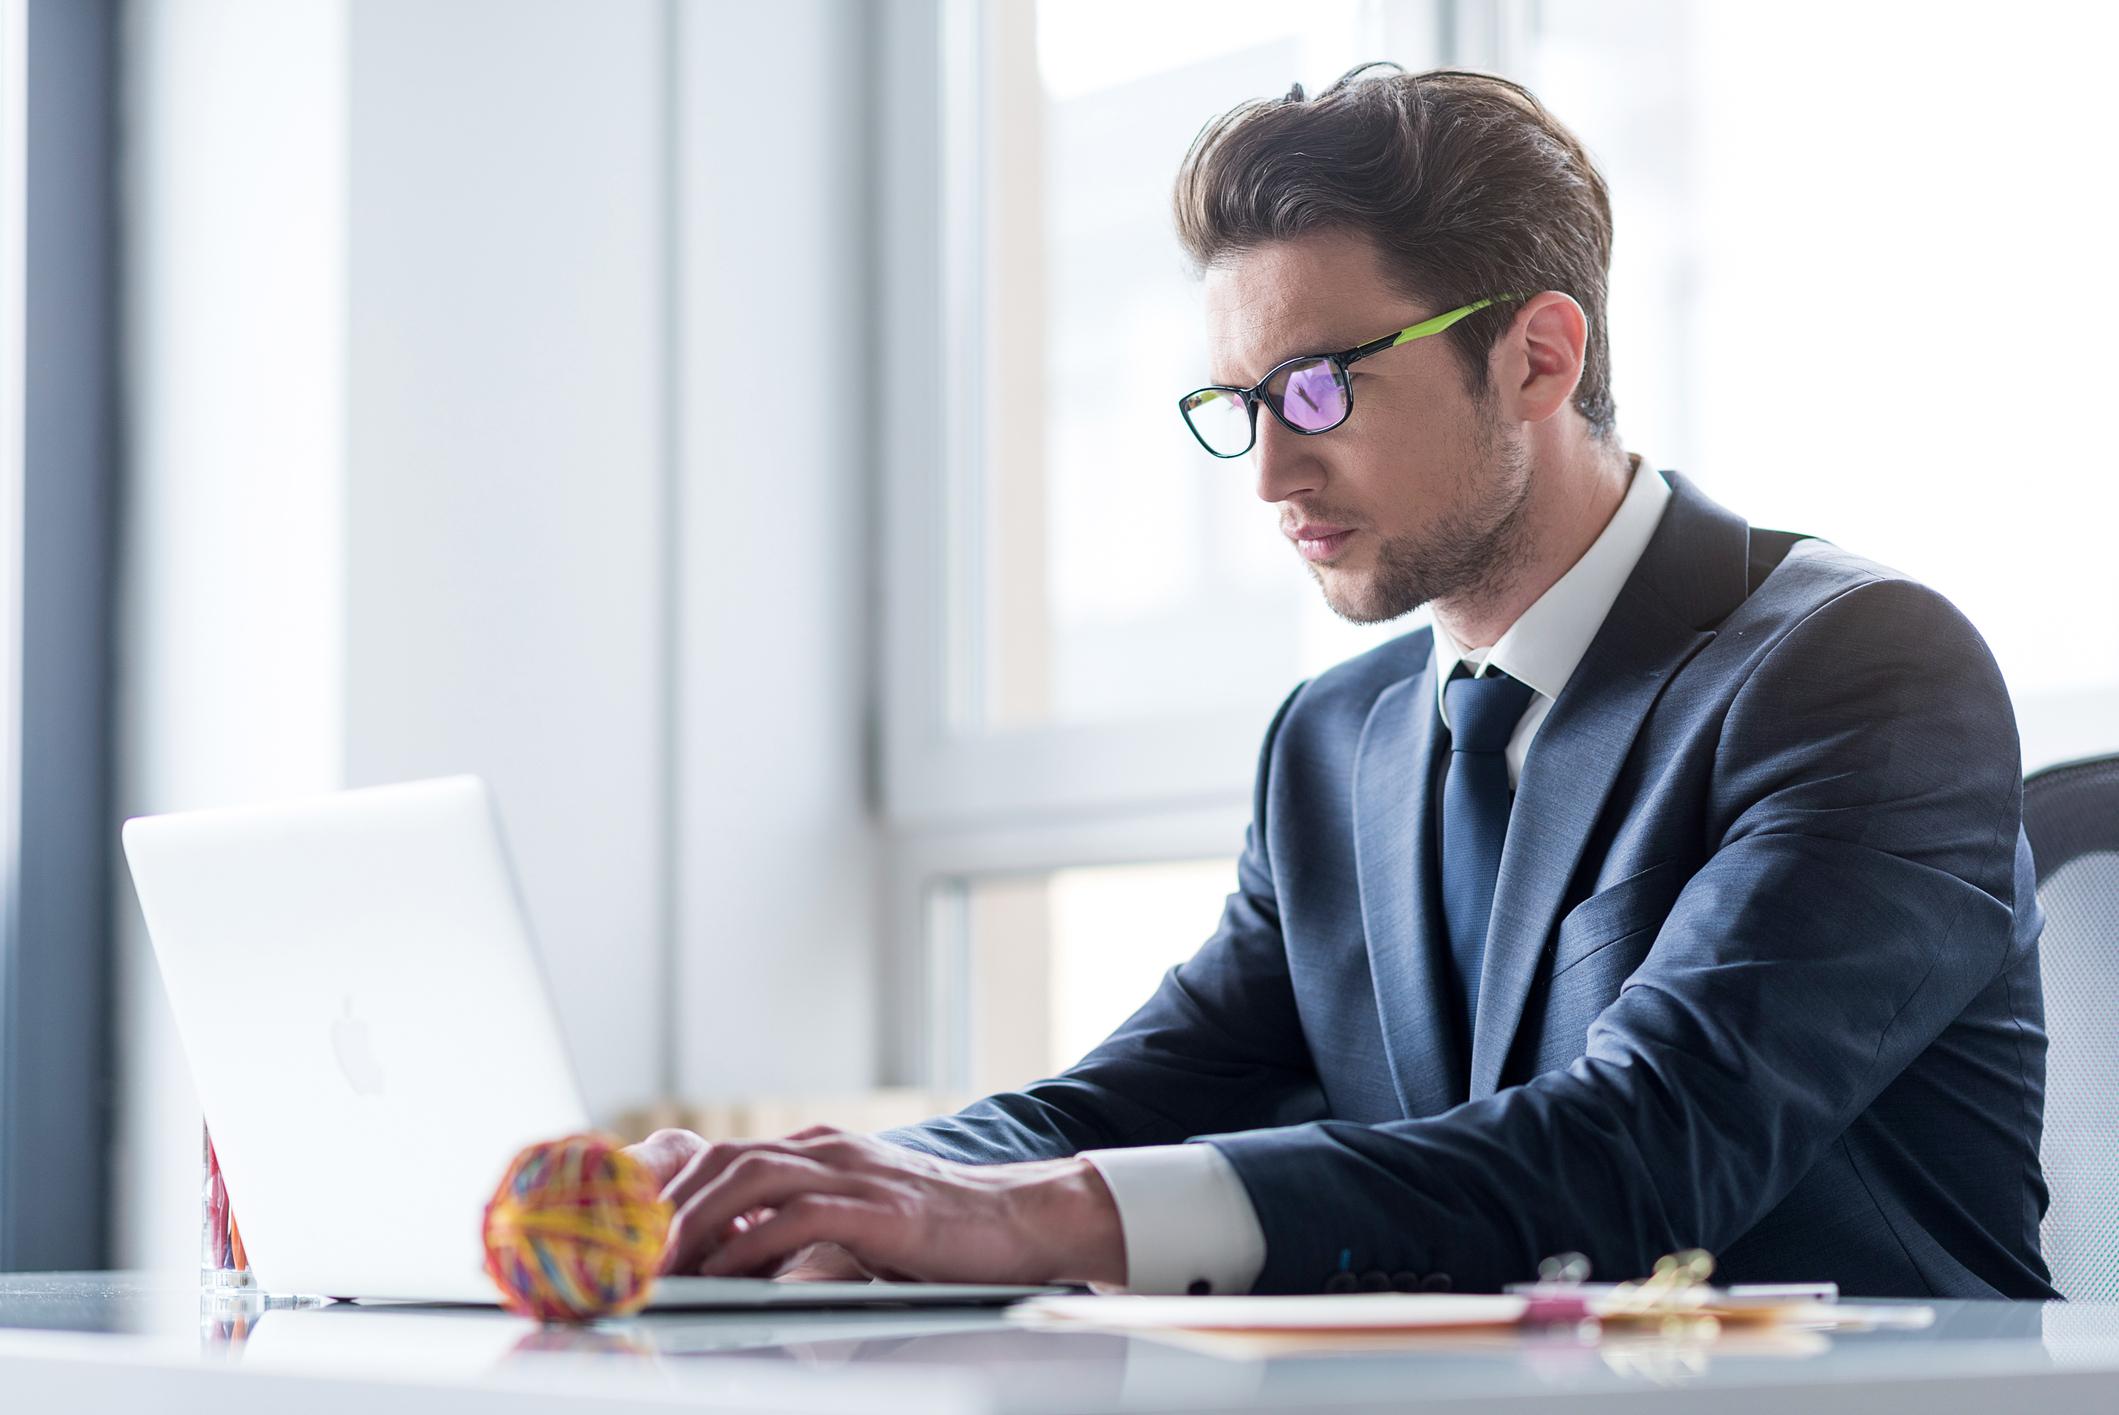 Man in suit typing on laptop.